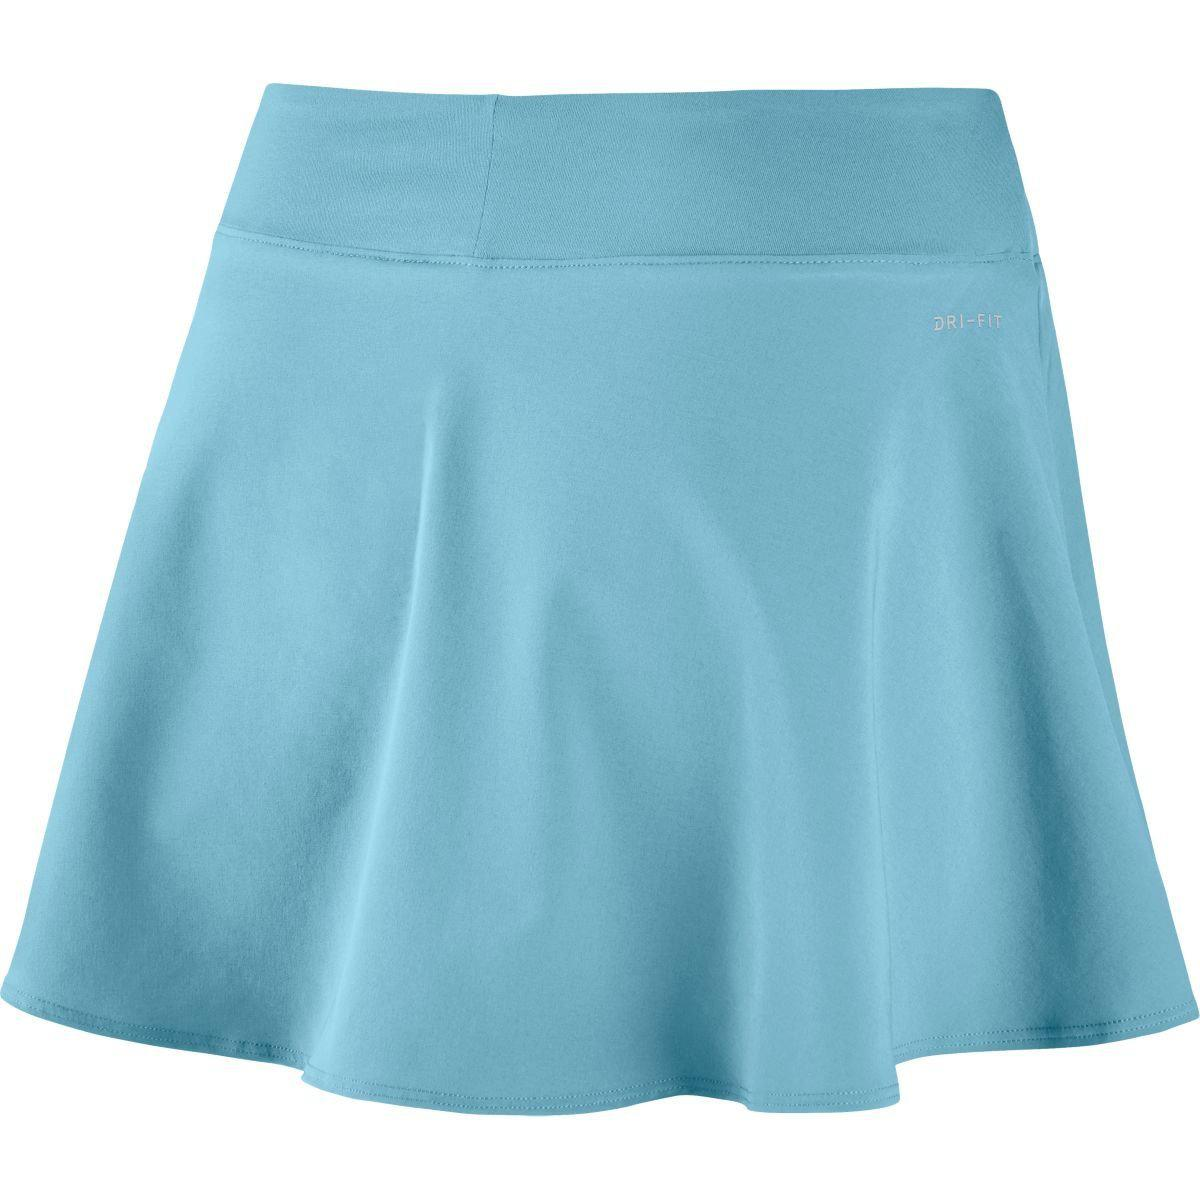 6d3cc0f30526 Lyst - Nike Court Flex Pure Tennis Skirt in Blue